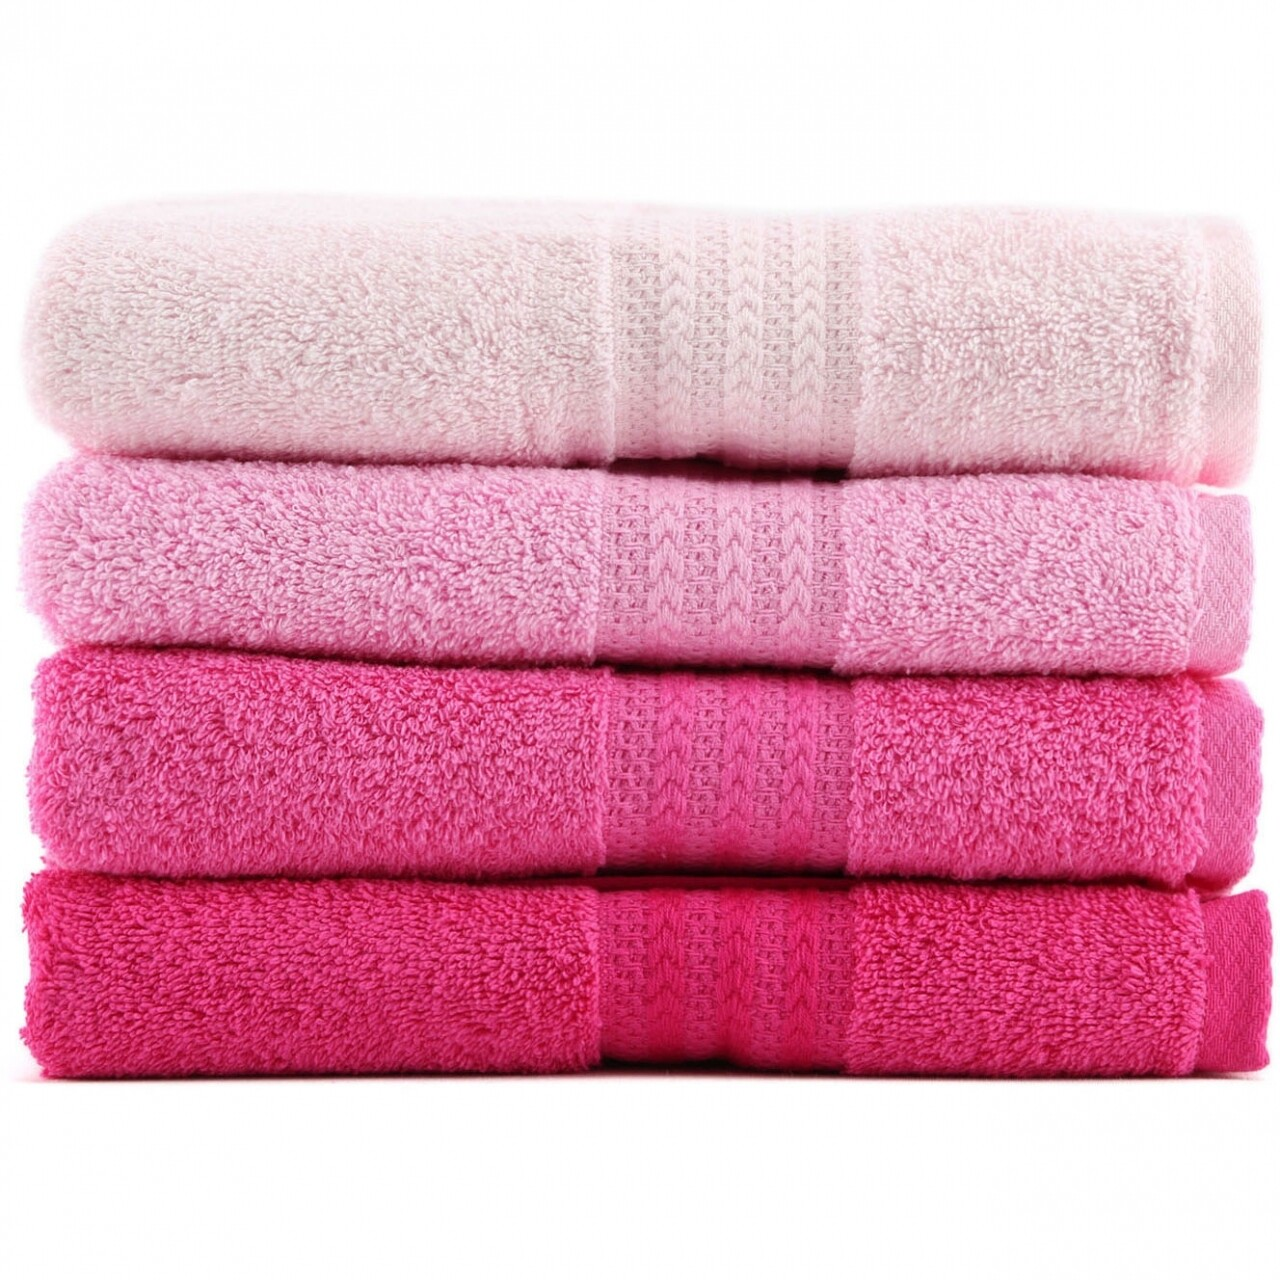 Set 4 prosoape de maini Pink Delight, Hobby,  50 x 90 cm, 100% bumbac, roz